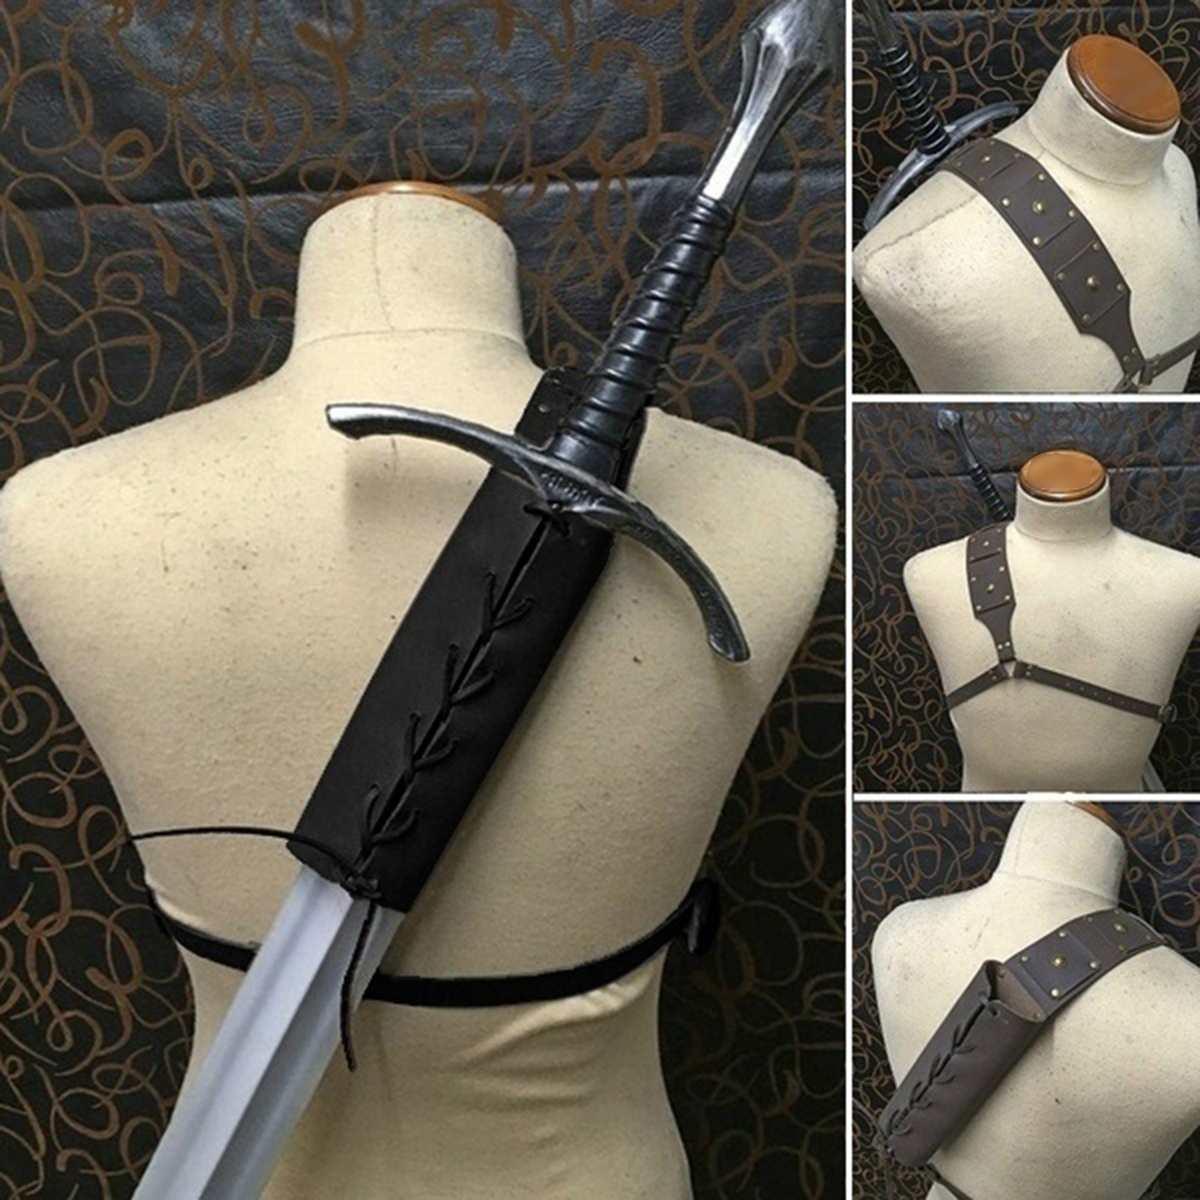 Adult Vintage Cosplay Costume Retro Coffee PU Leather Strap Scabbard Shoulder-back Sword Holder